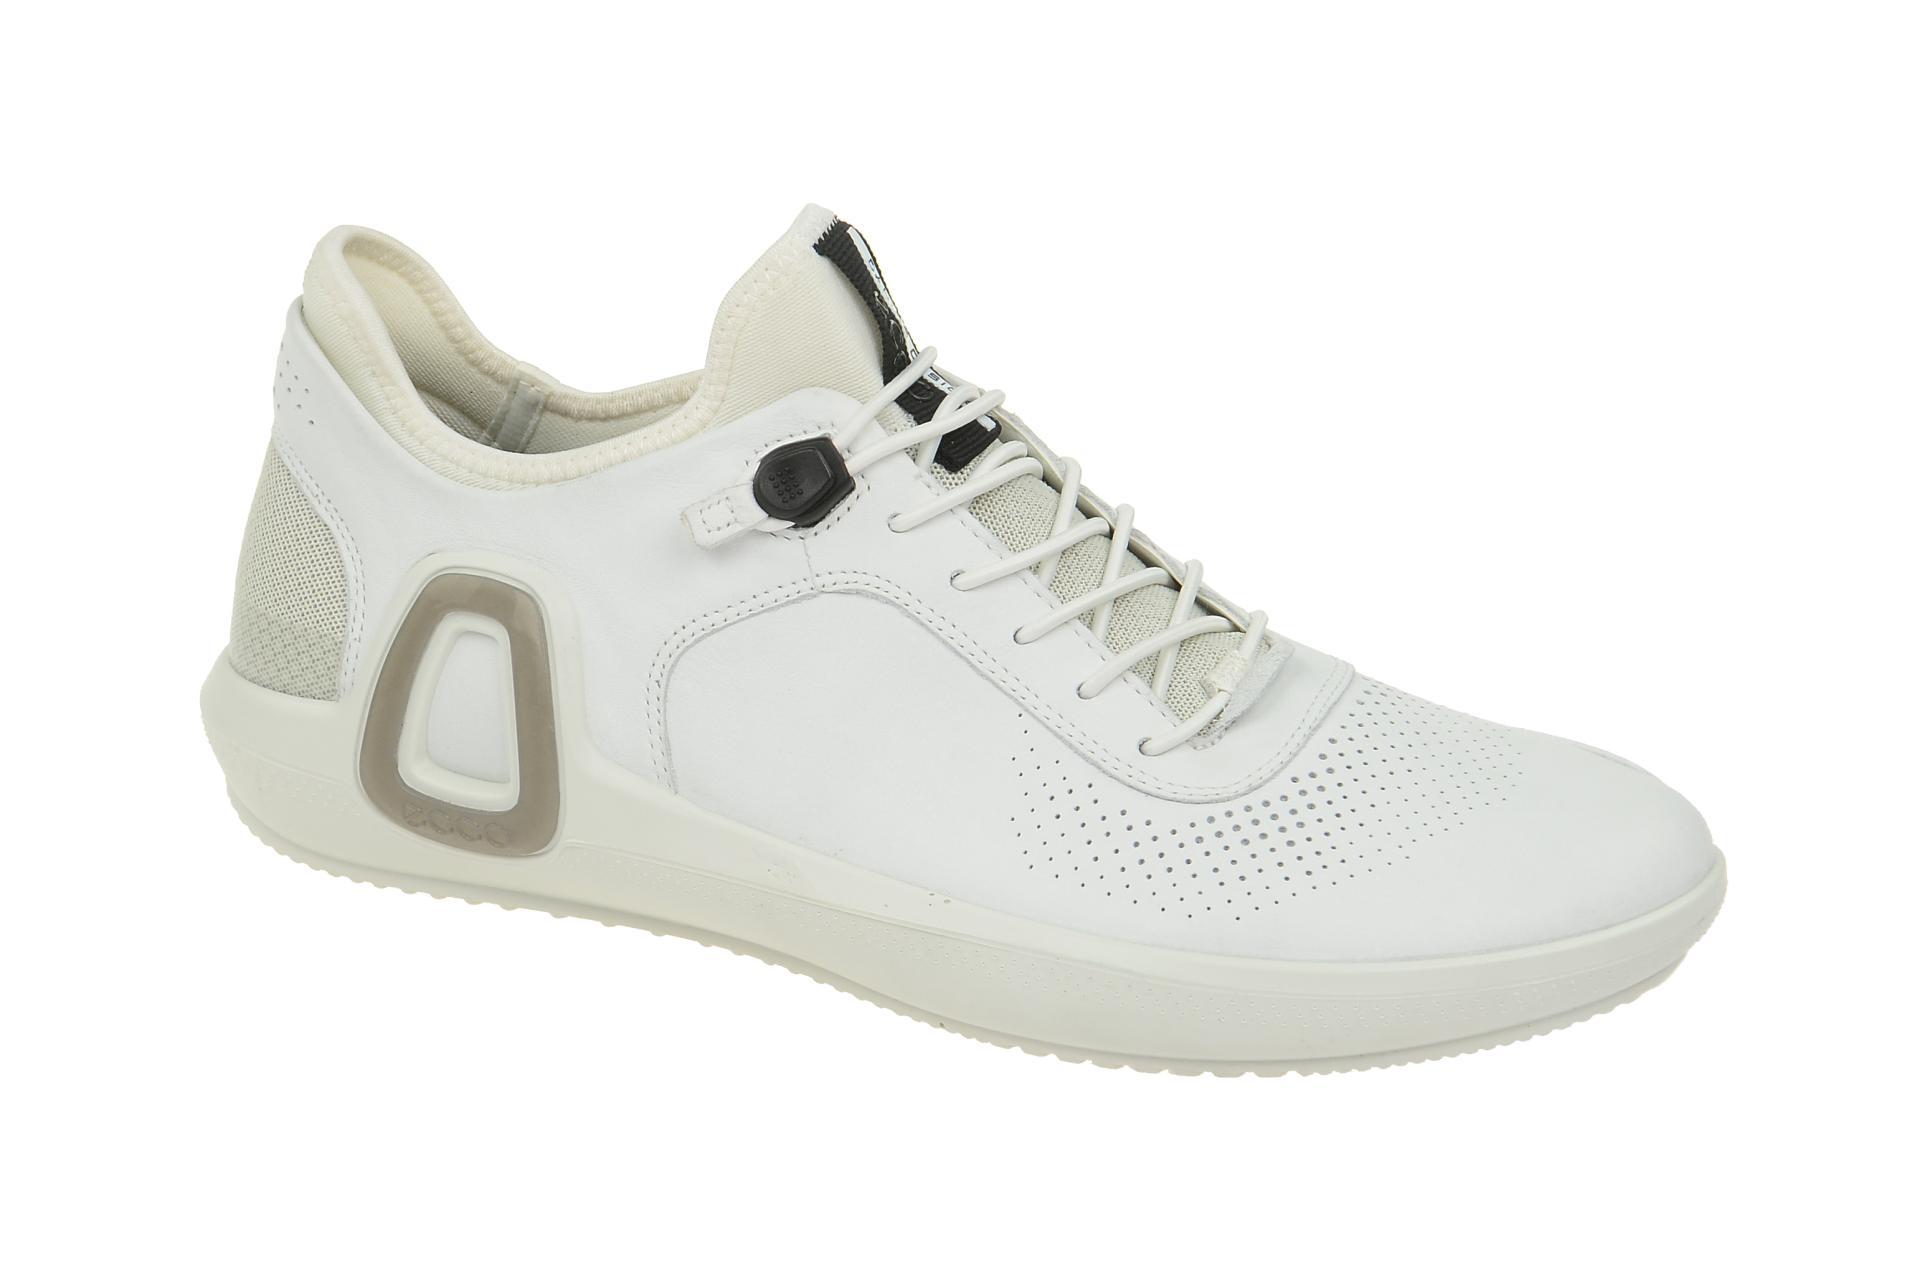 Specials Angebot FrühjahrSommer Sneakers ECCO Intrinsic 1